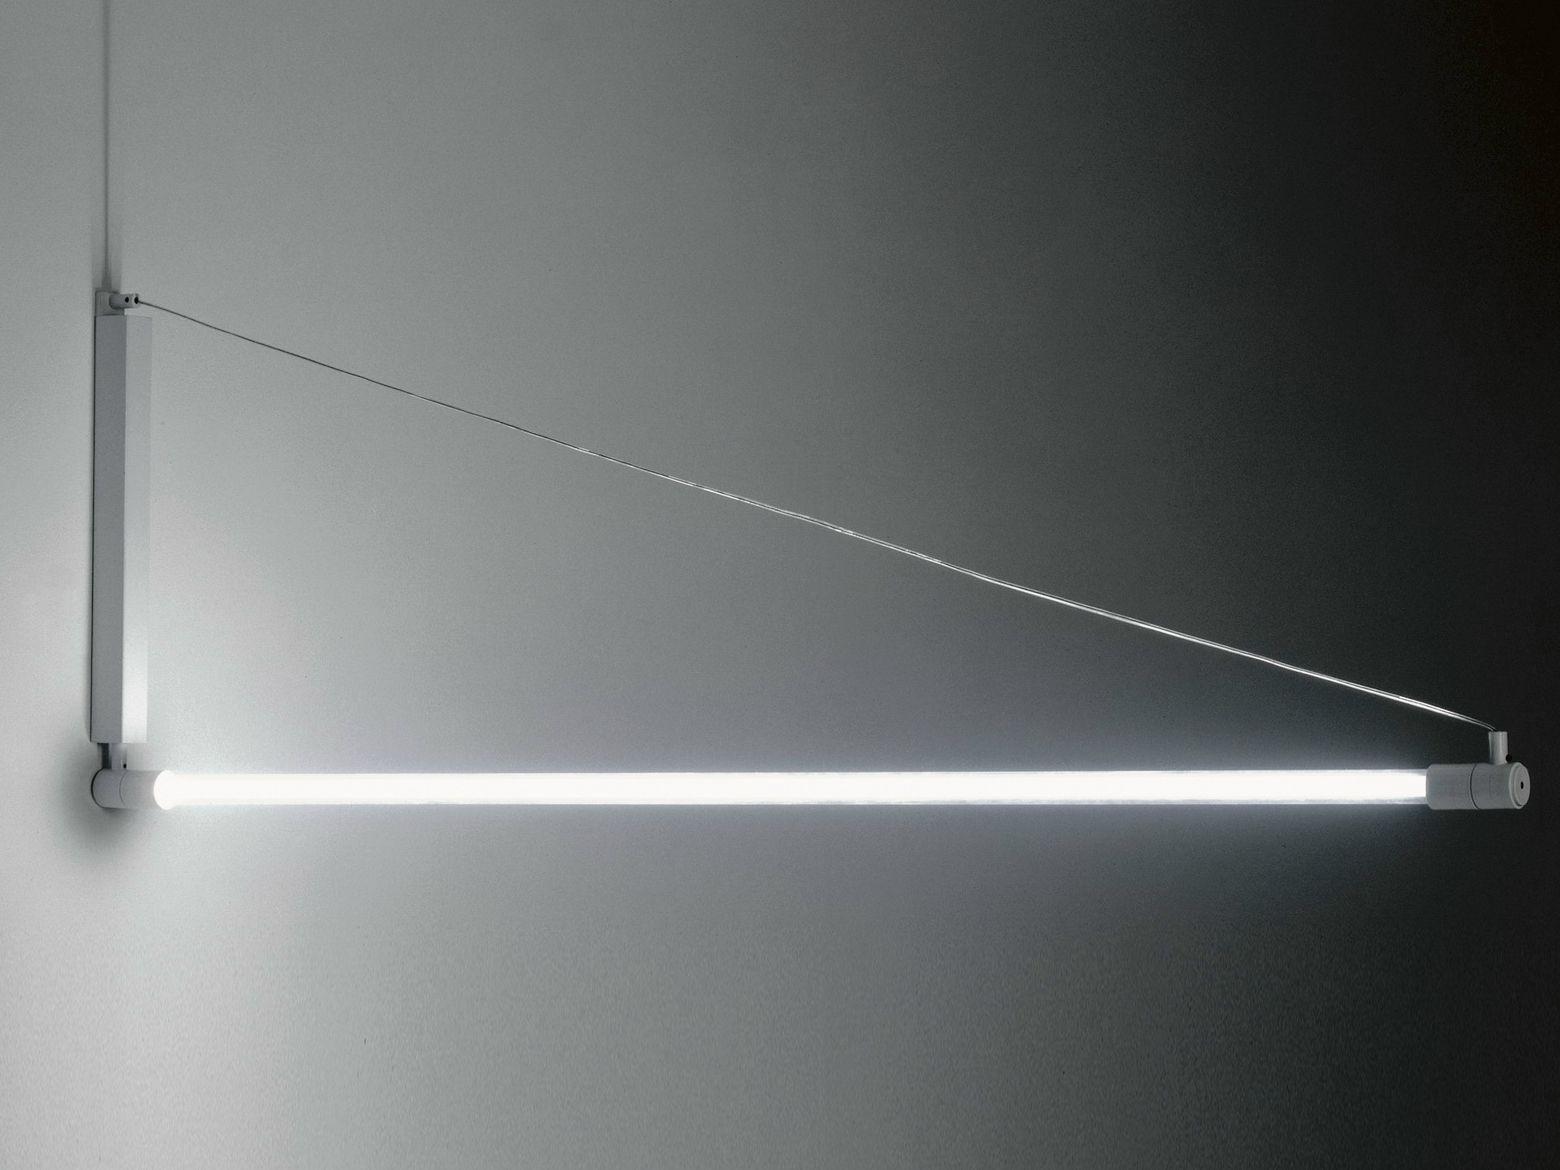 Lampade da parete a led per interni led lampada da parete - Lampade ikea da parete ...